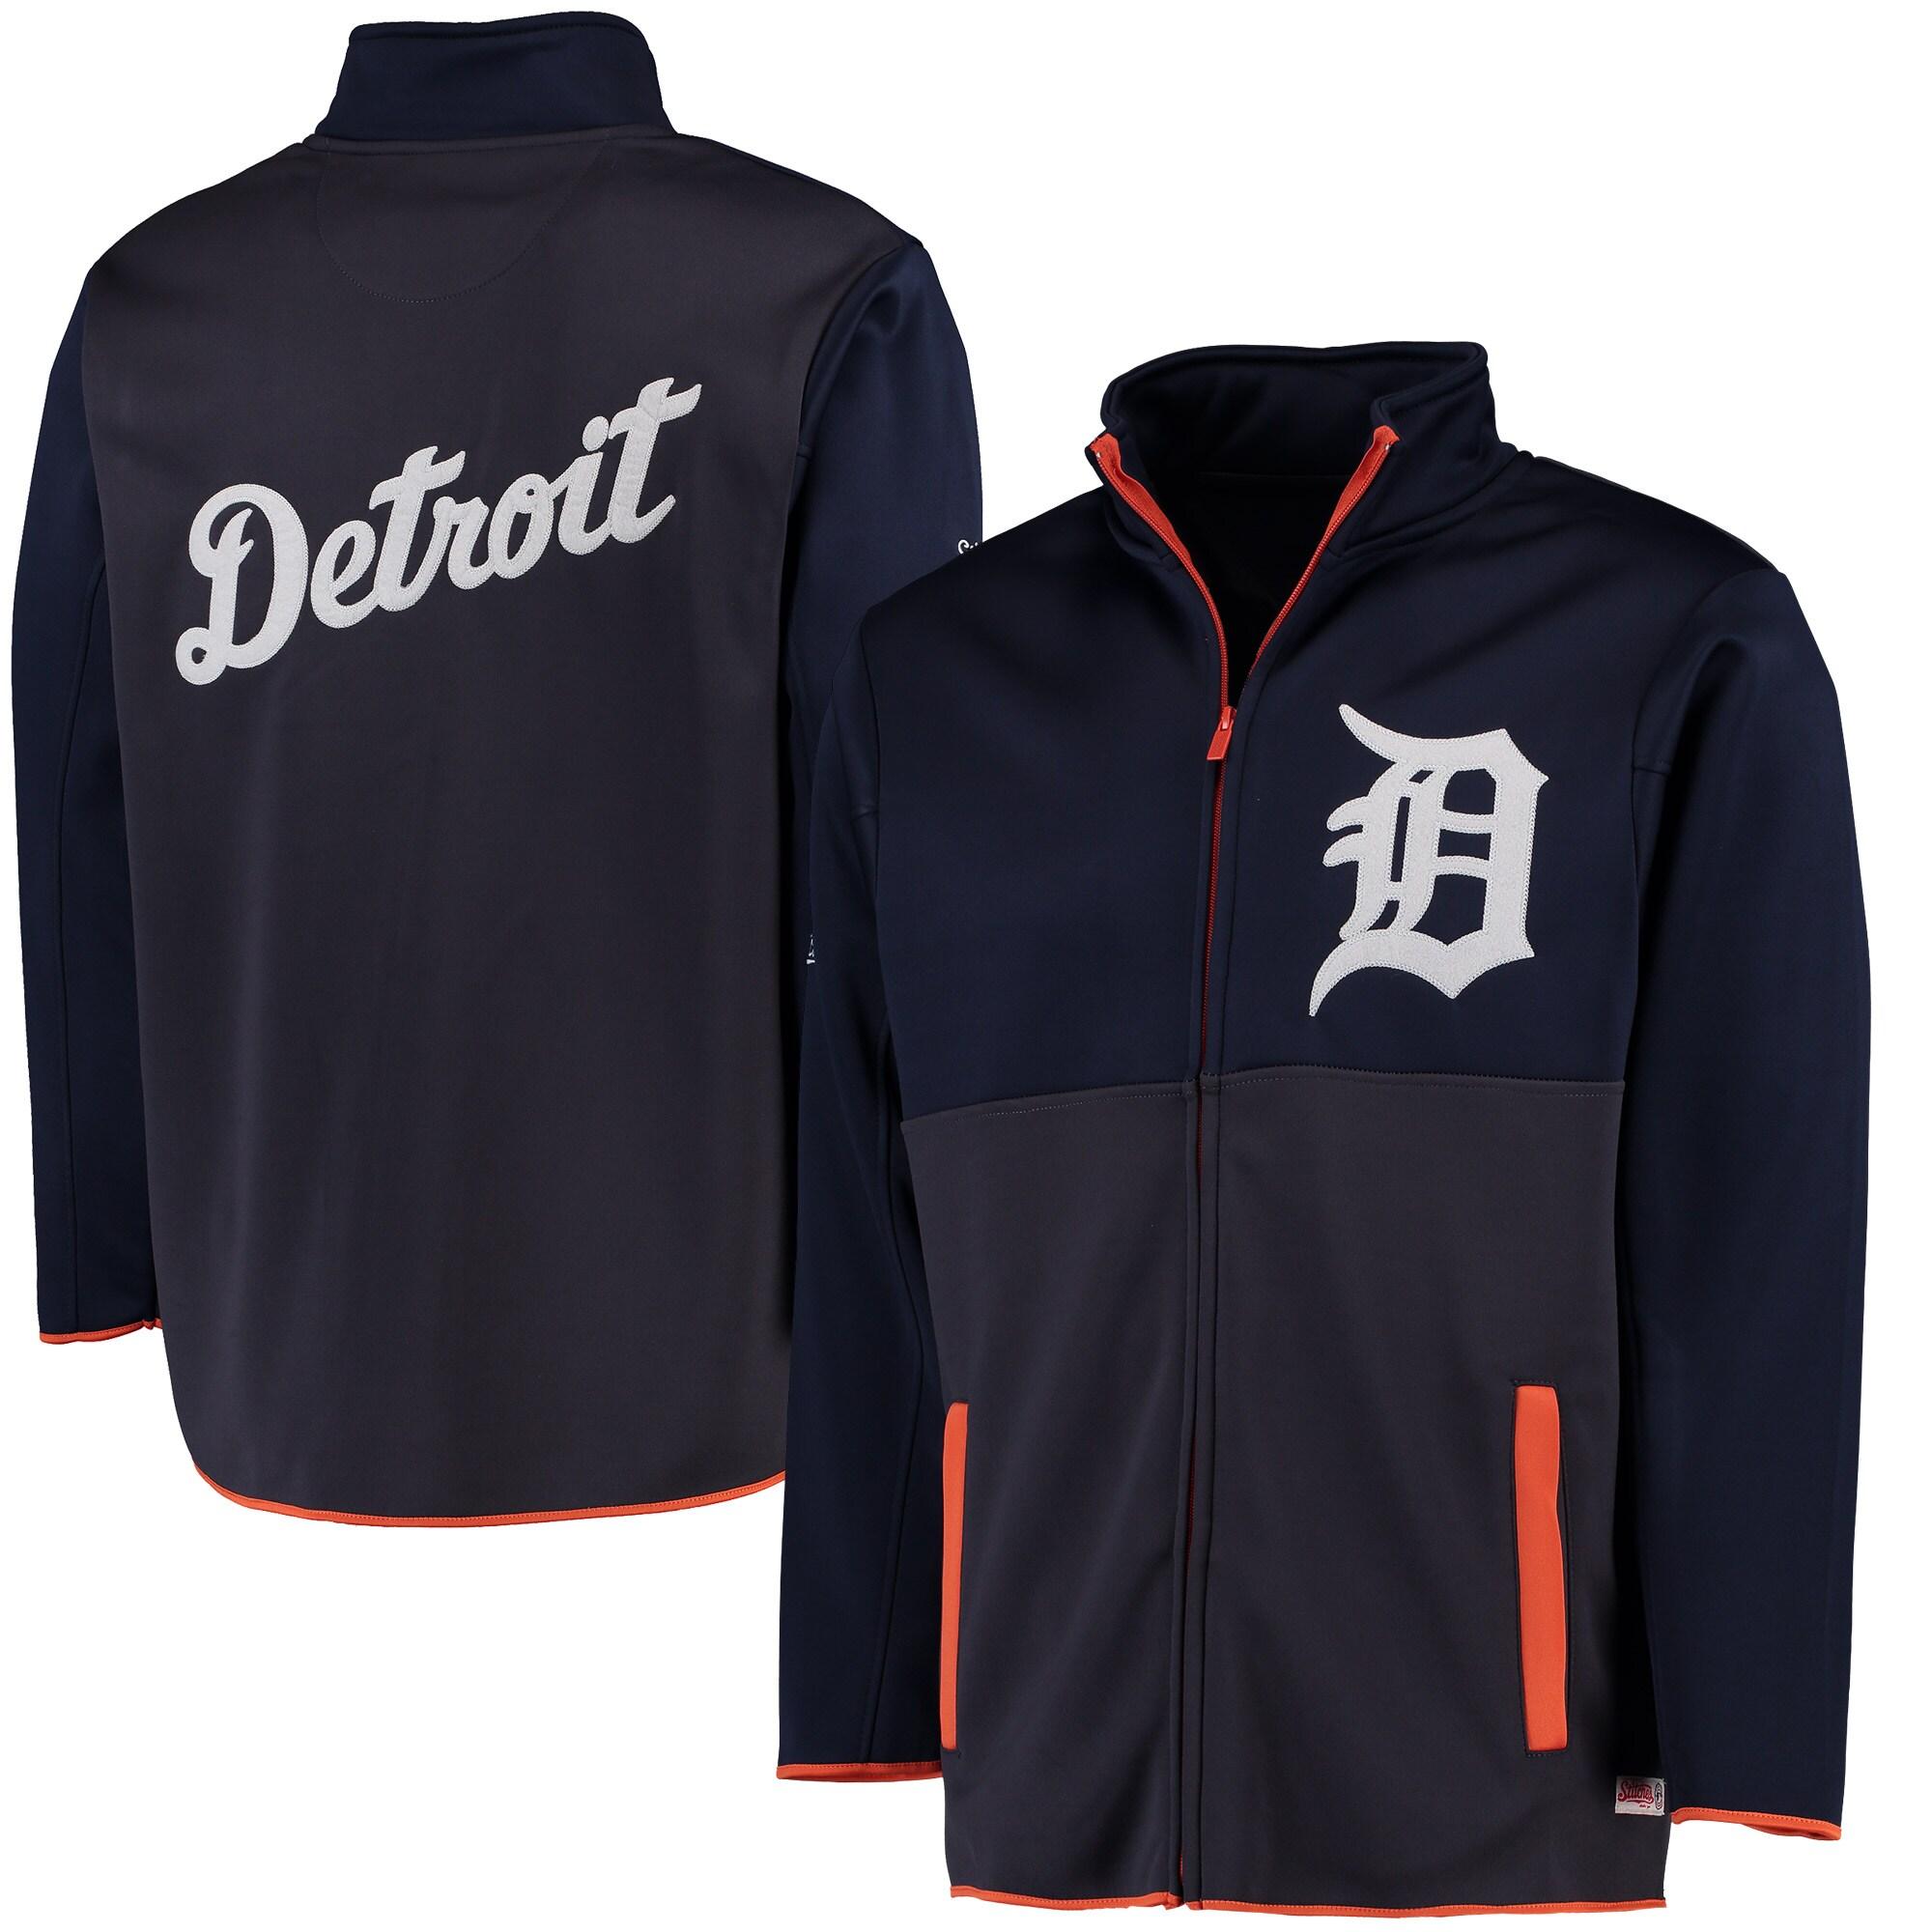 Detroit Tigers Stitches Fashion Track Jacket - Navy